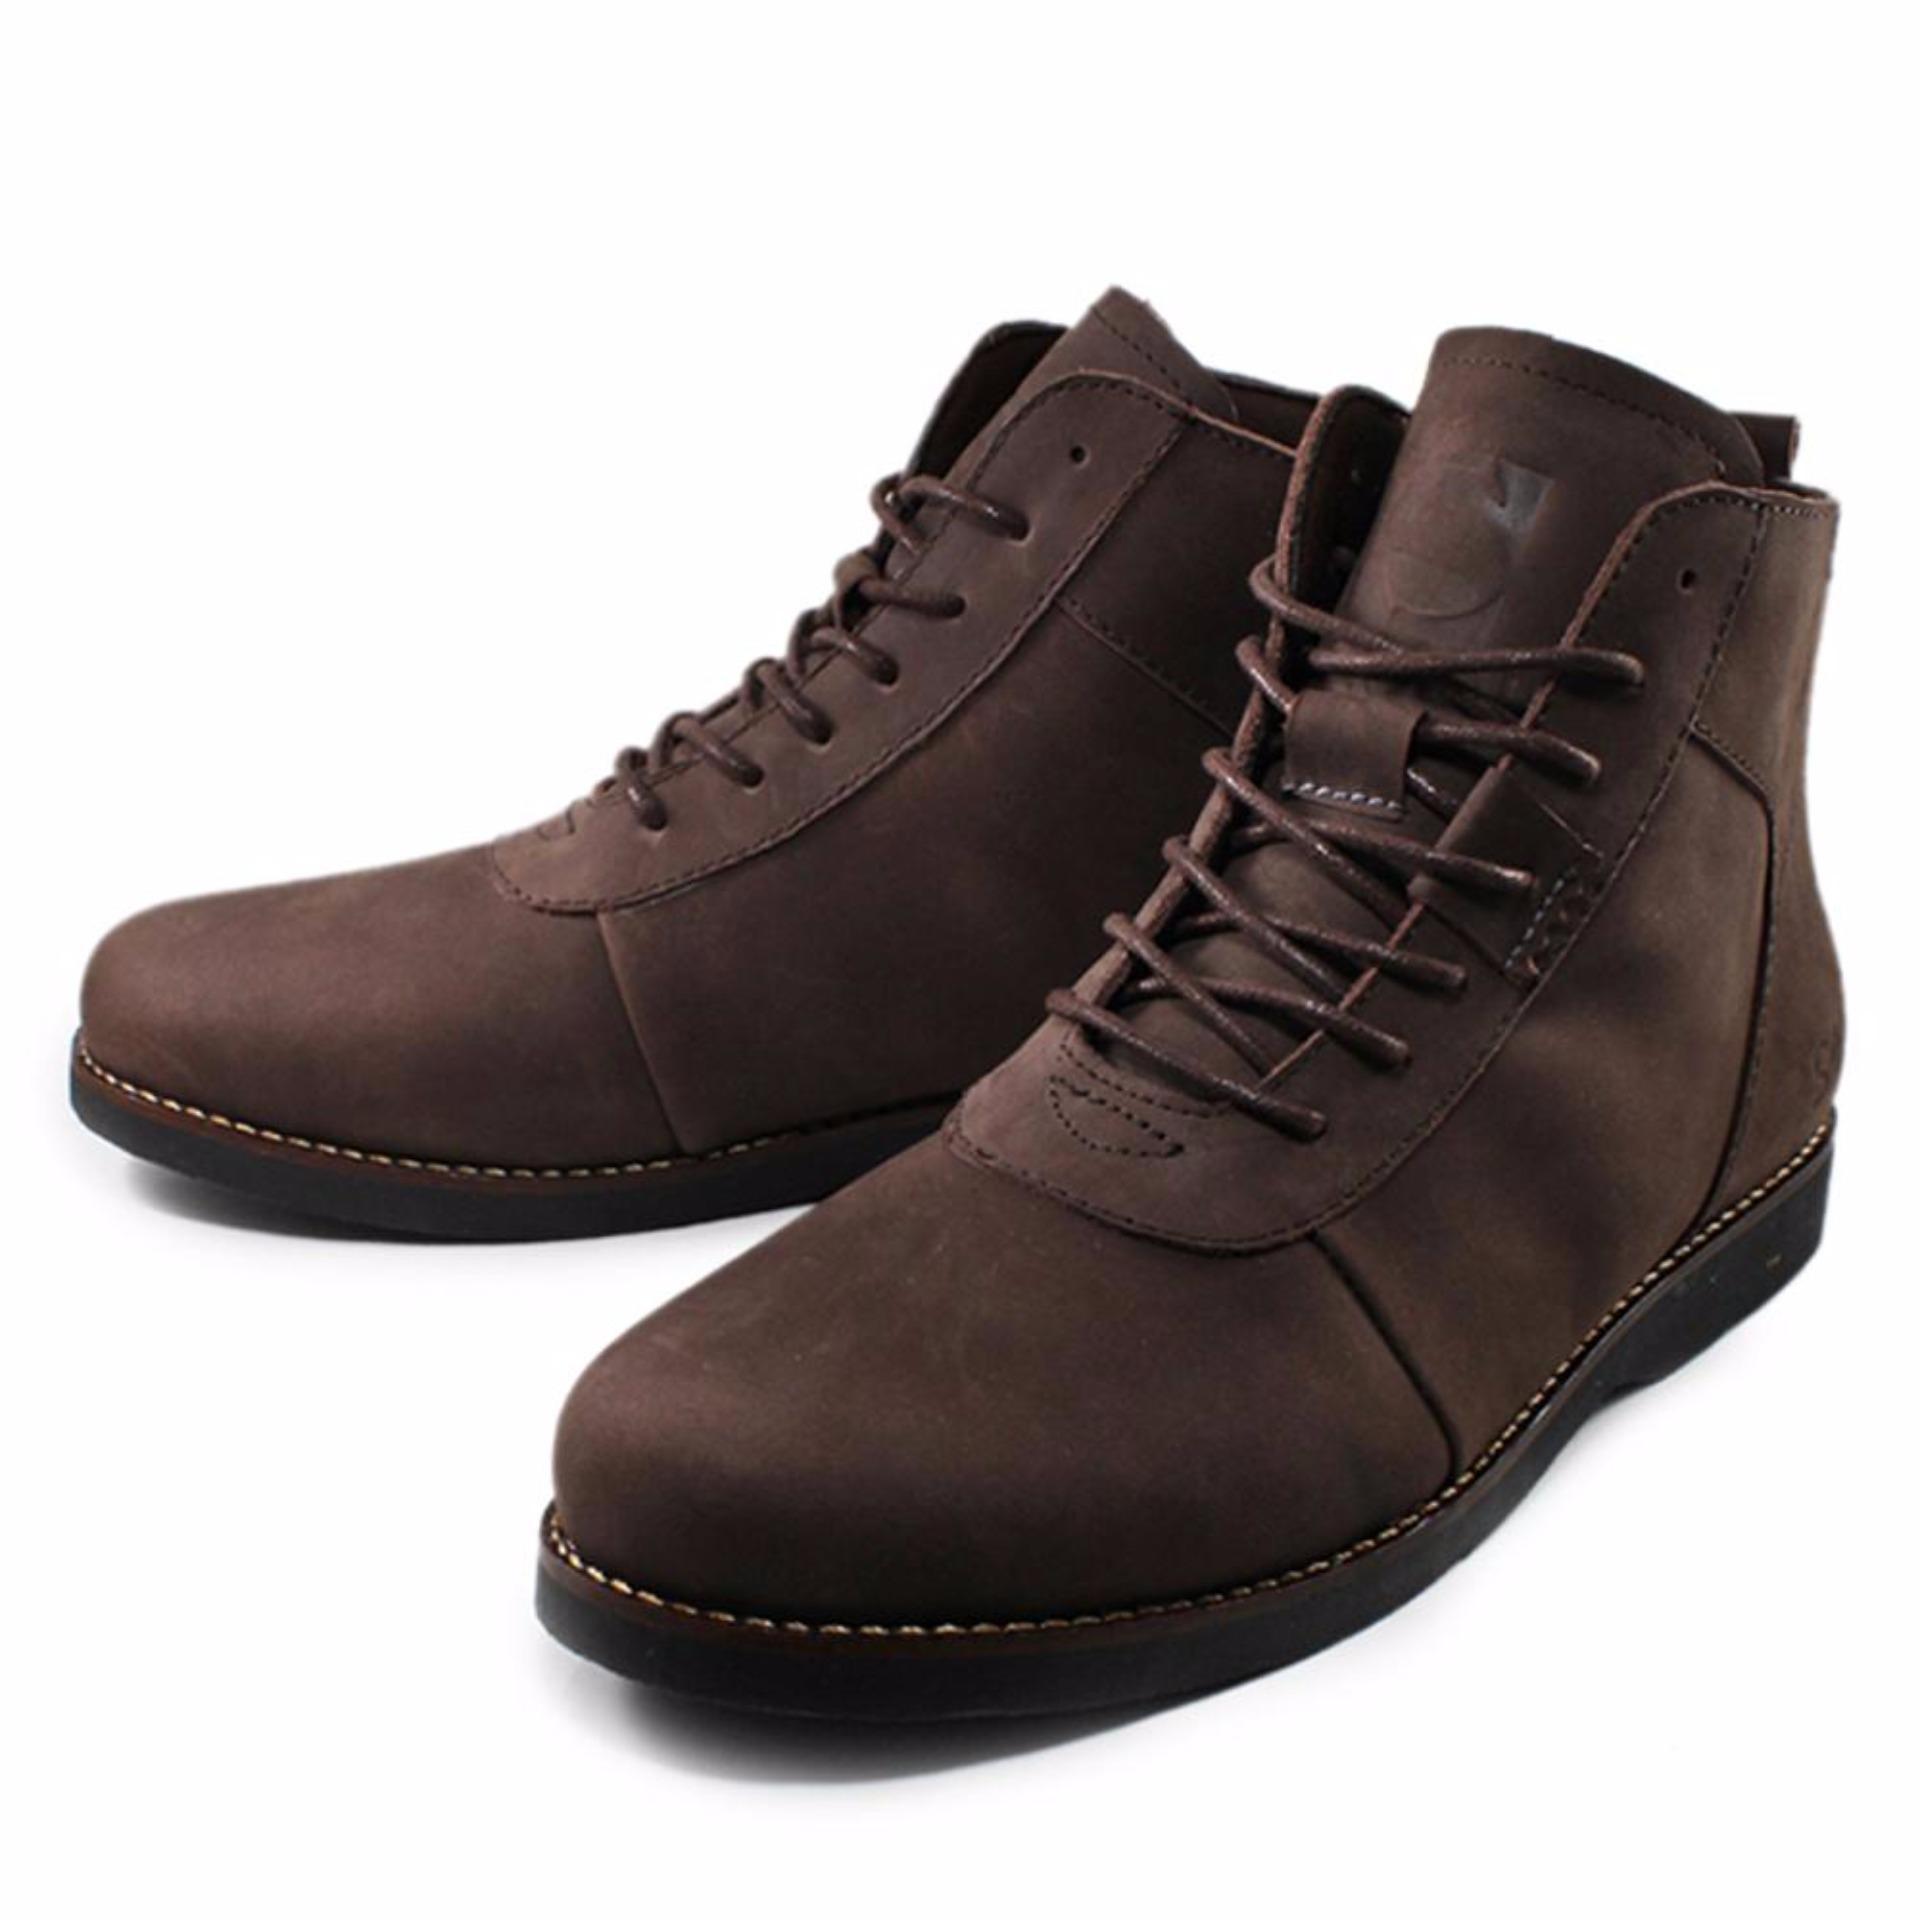 Sepatu Pria Brodo Boots Sauqi Footwear Sepatu Kulit Asli Casual Formal Men's Boots Premium Leather